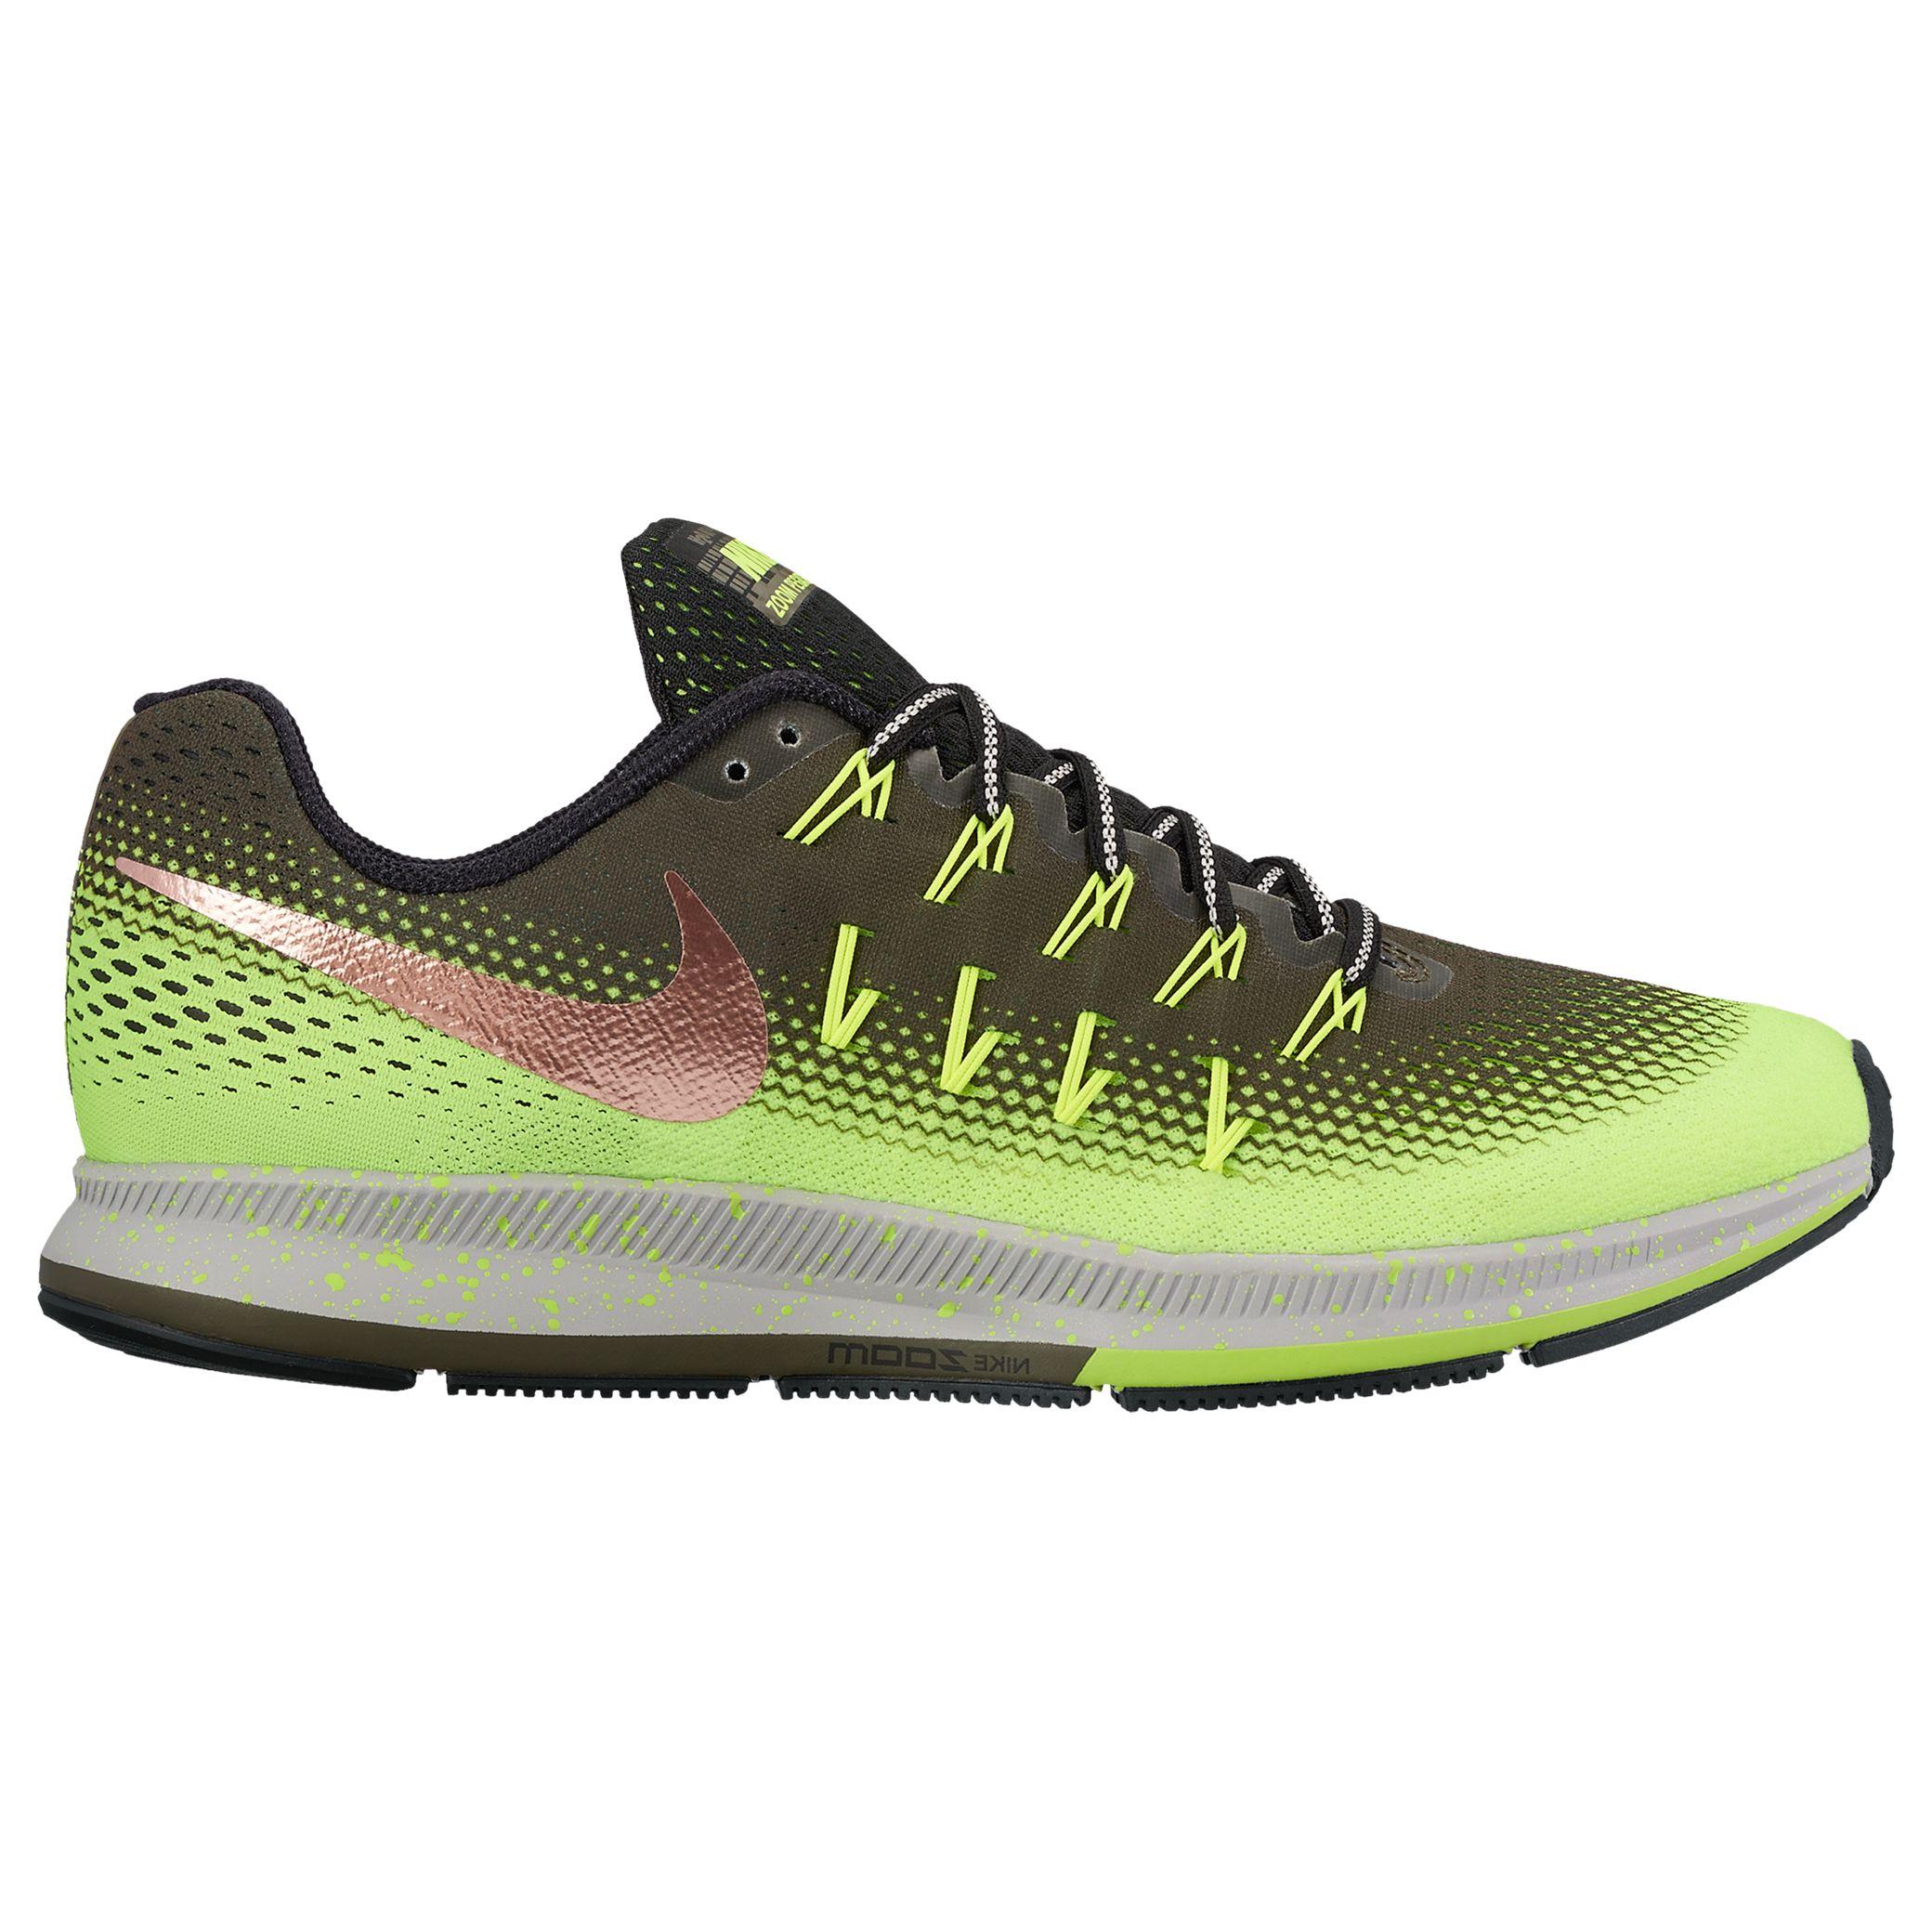 487f67c58ce75 Nike Air Zoom Pegasus 33 Shield Men s Running Shoes